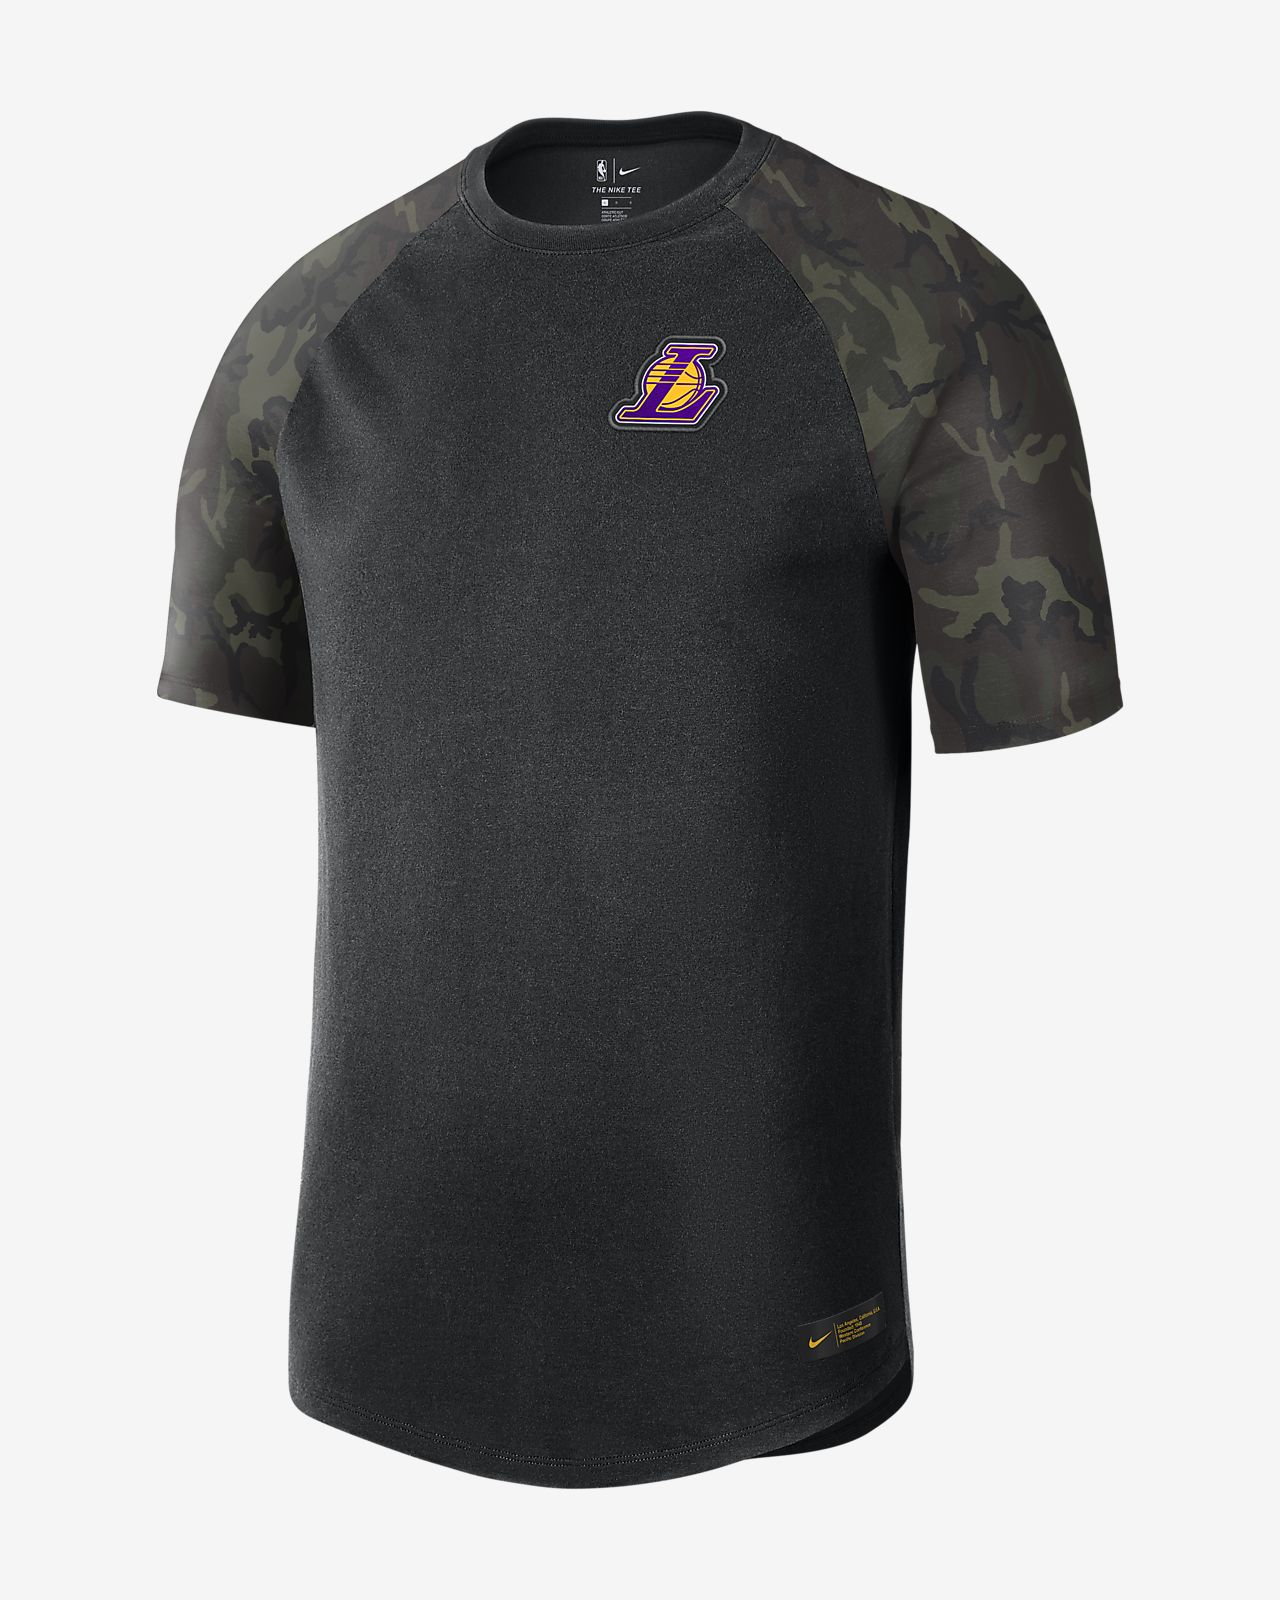 Los Angeles Lakers Nike Men's NBA T-Shirt